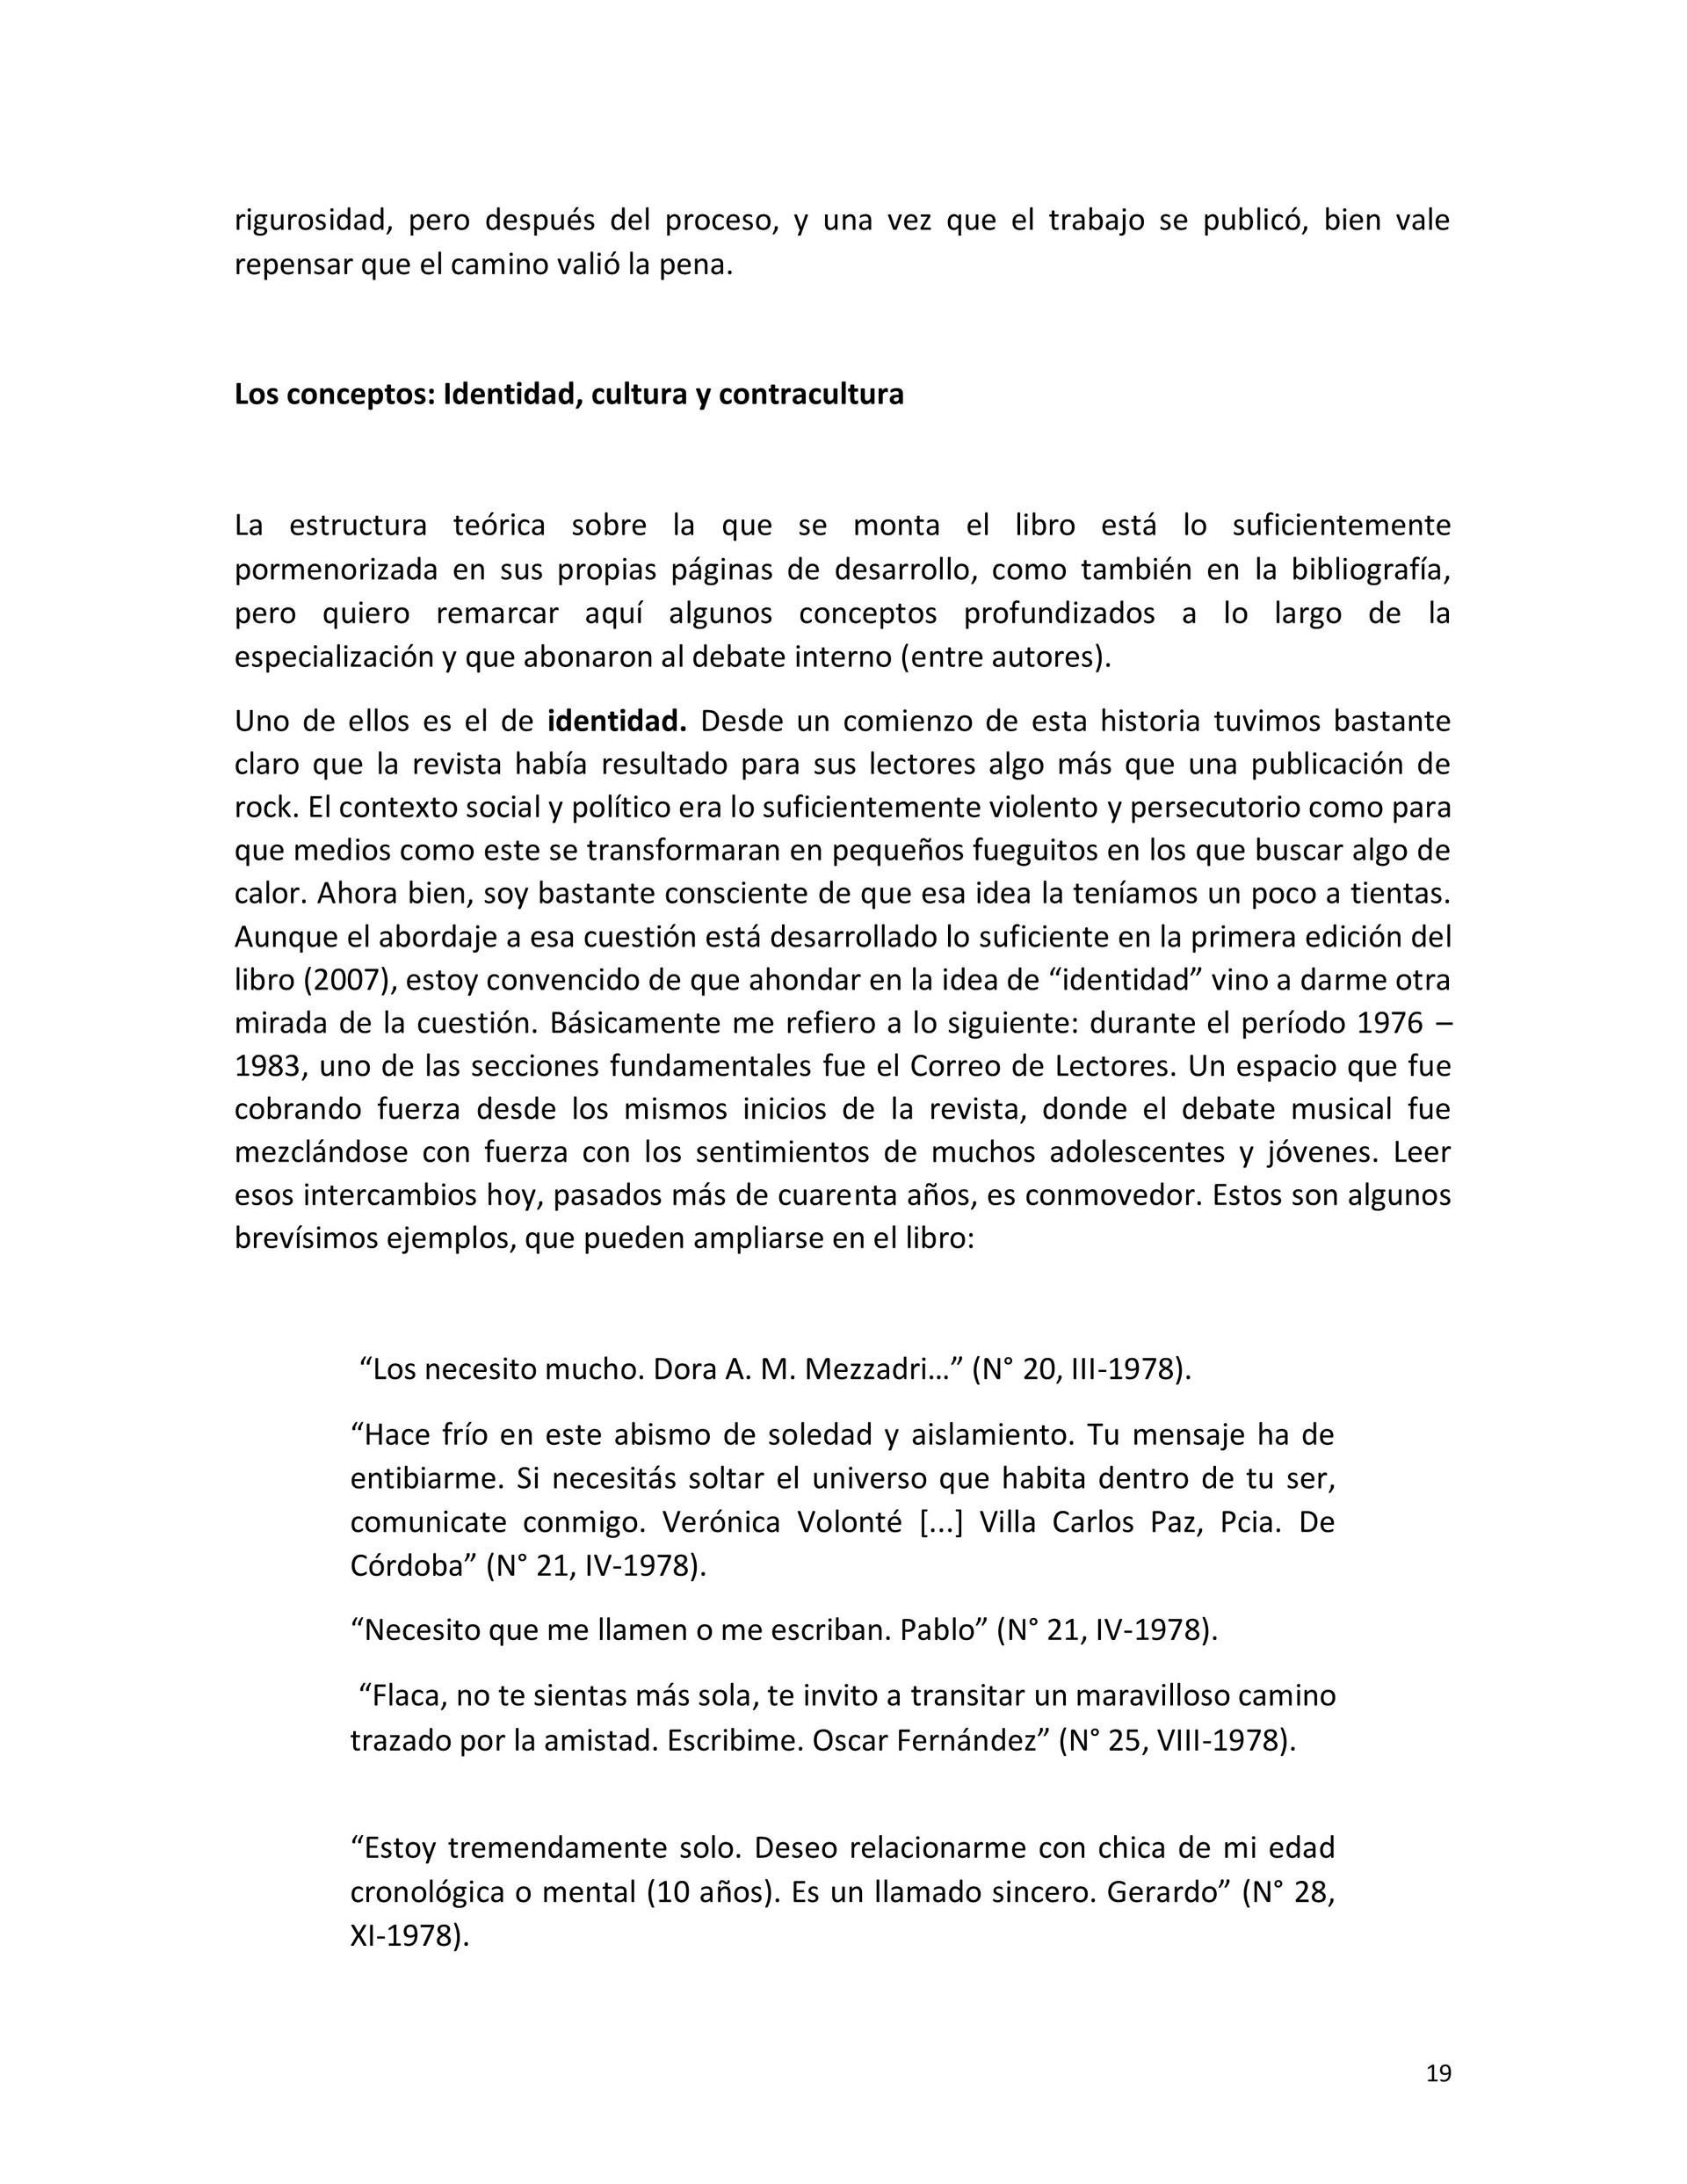 estacion_Page_18.jpeg